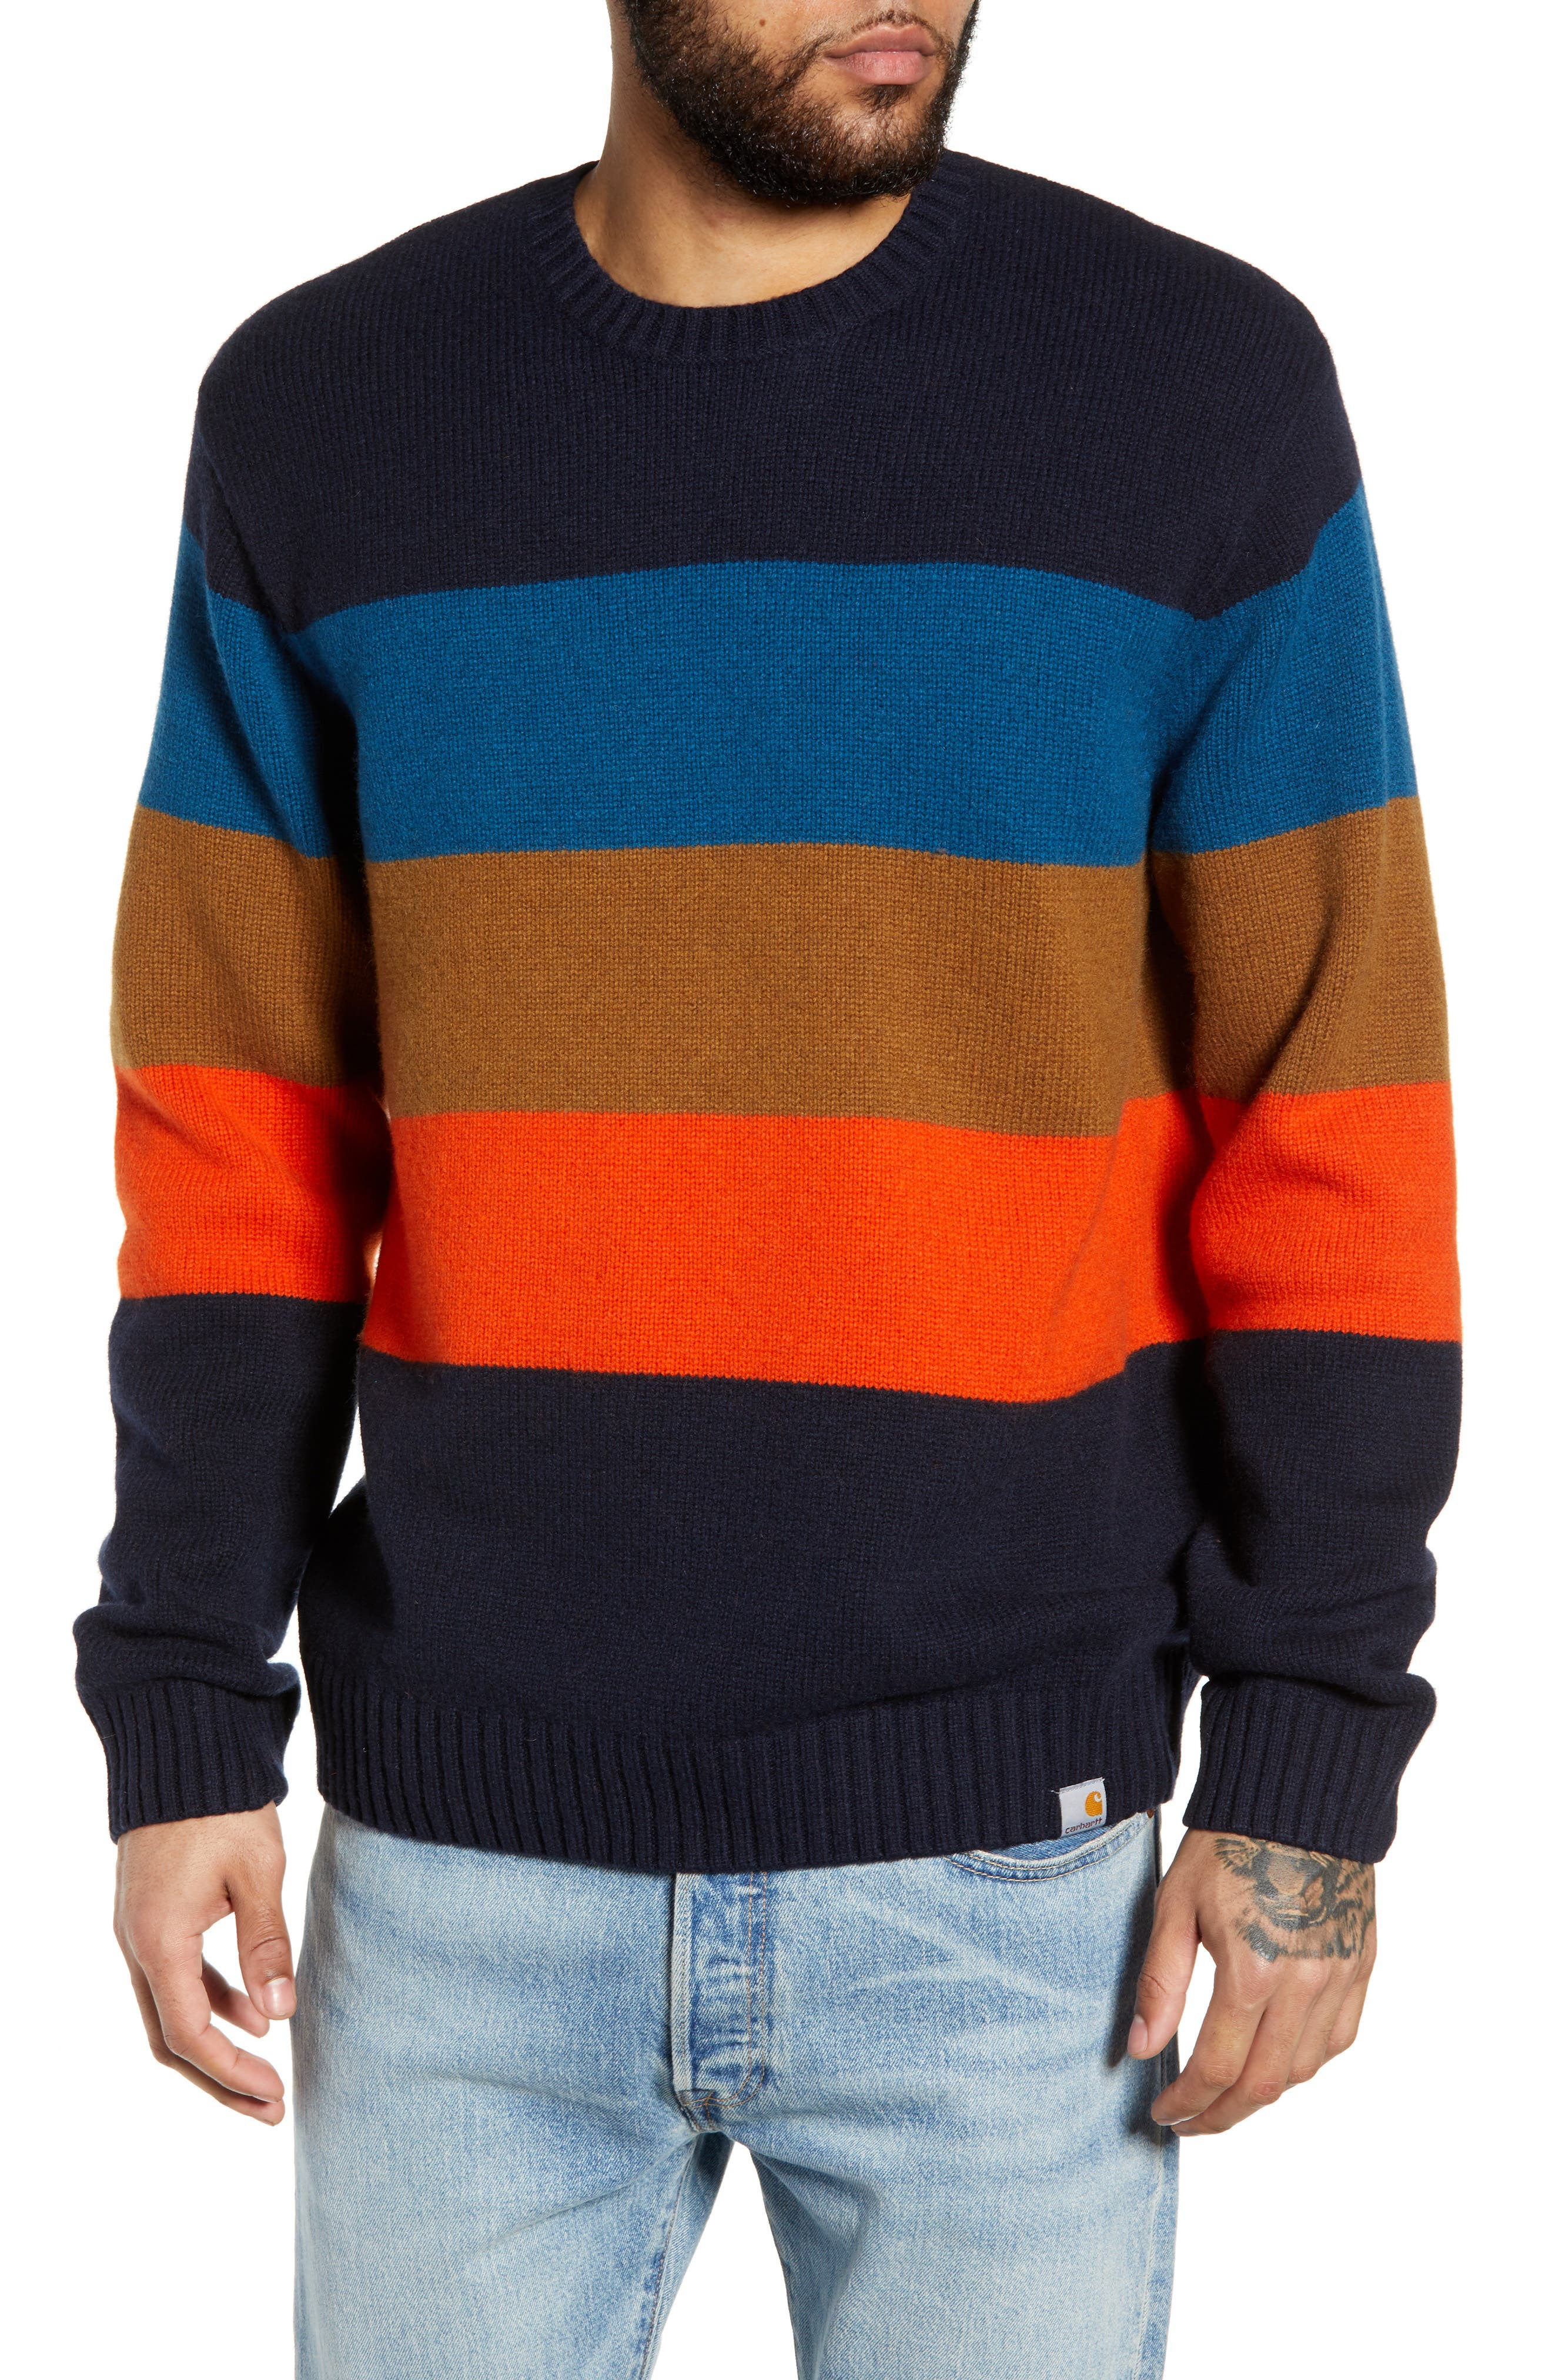 Goldner Stripe Wool Sweater,                             Main thumbnail 1, color,                             GOLD STRIPE DARK NAVY